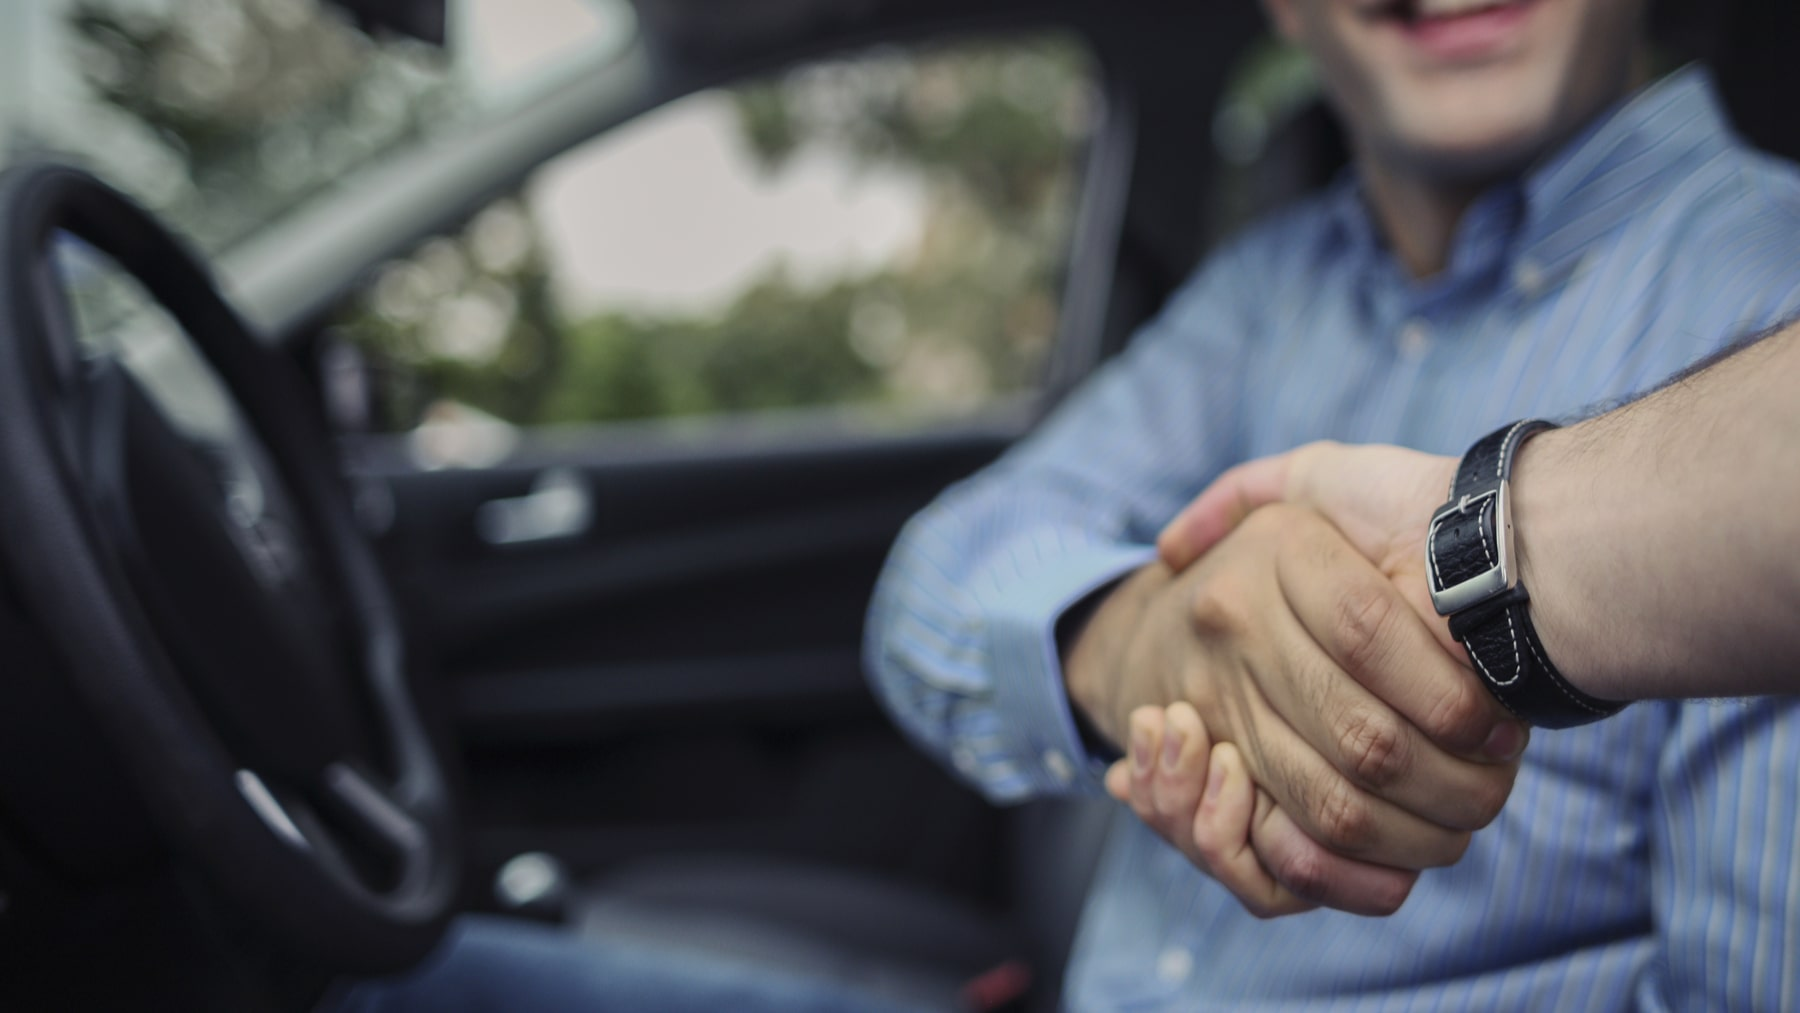 autos-usados-4-aspectos-clave-que-guiaran-tu-compra